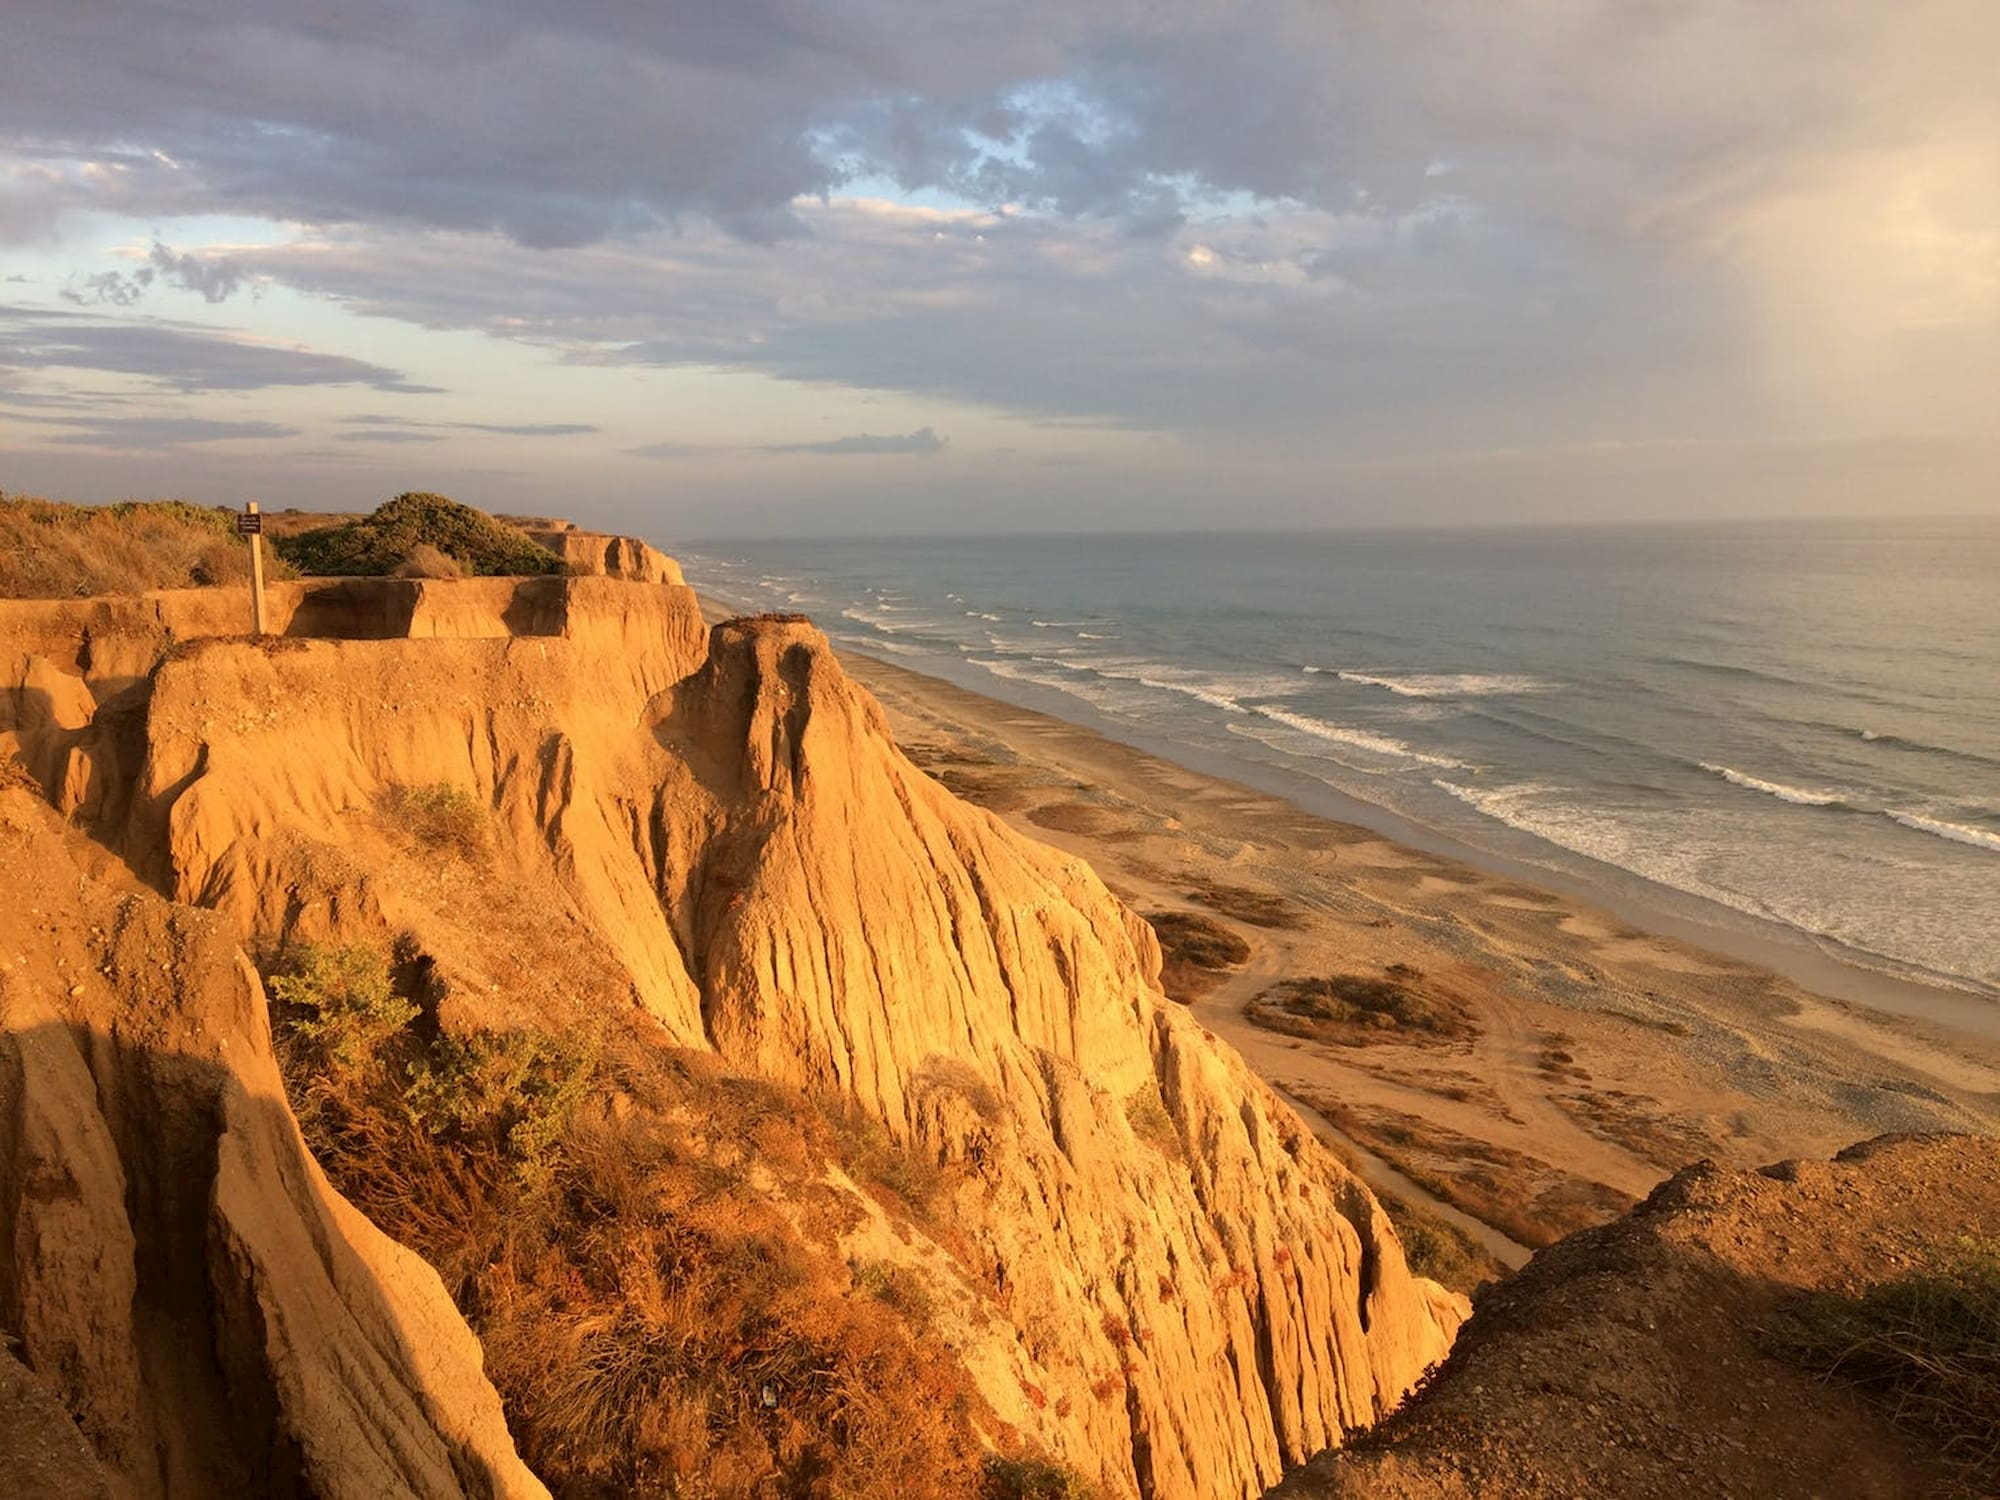 Viewpoint overlooking California's coastal cliffs and beach below.